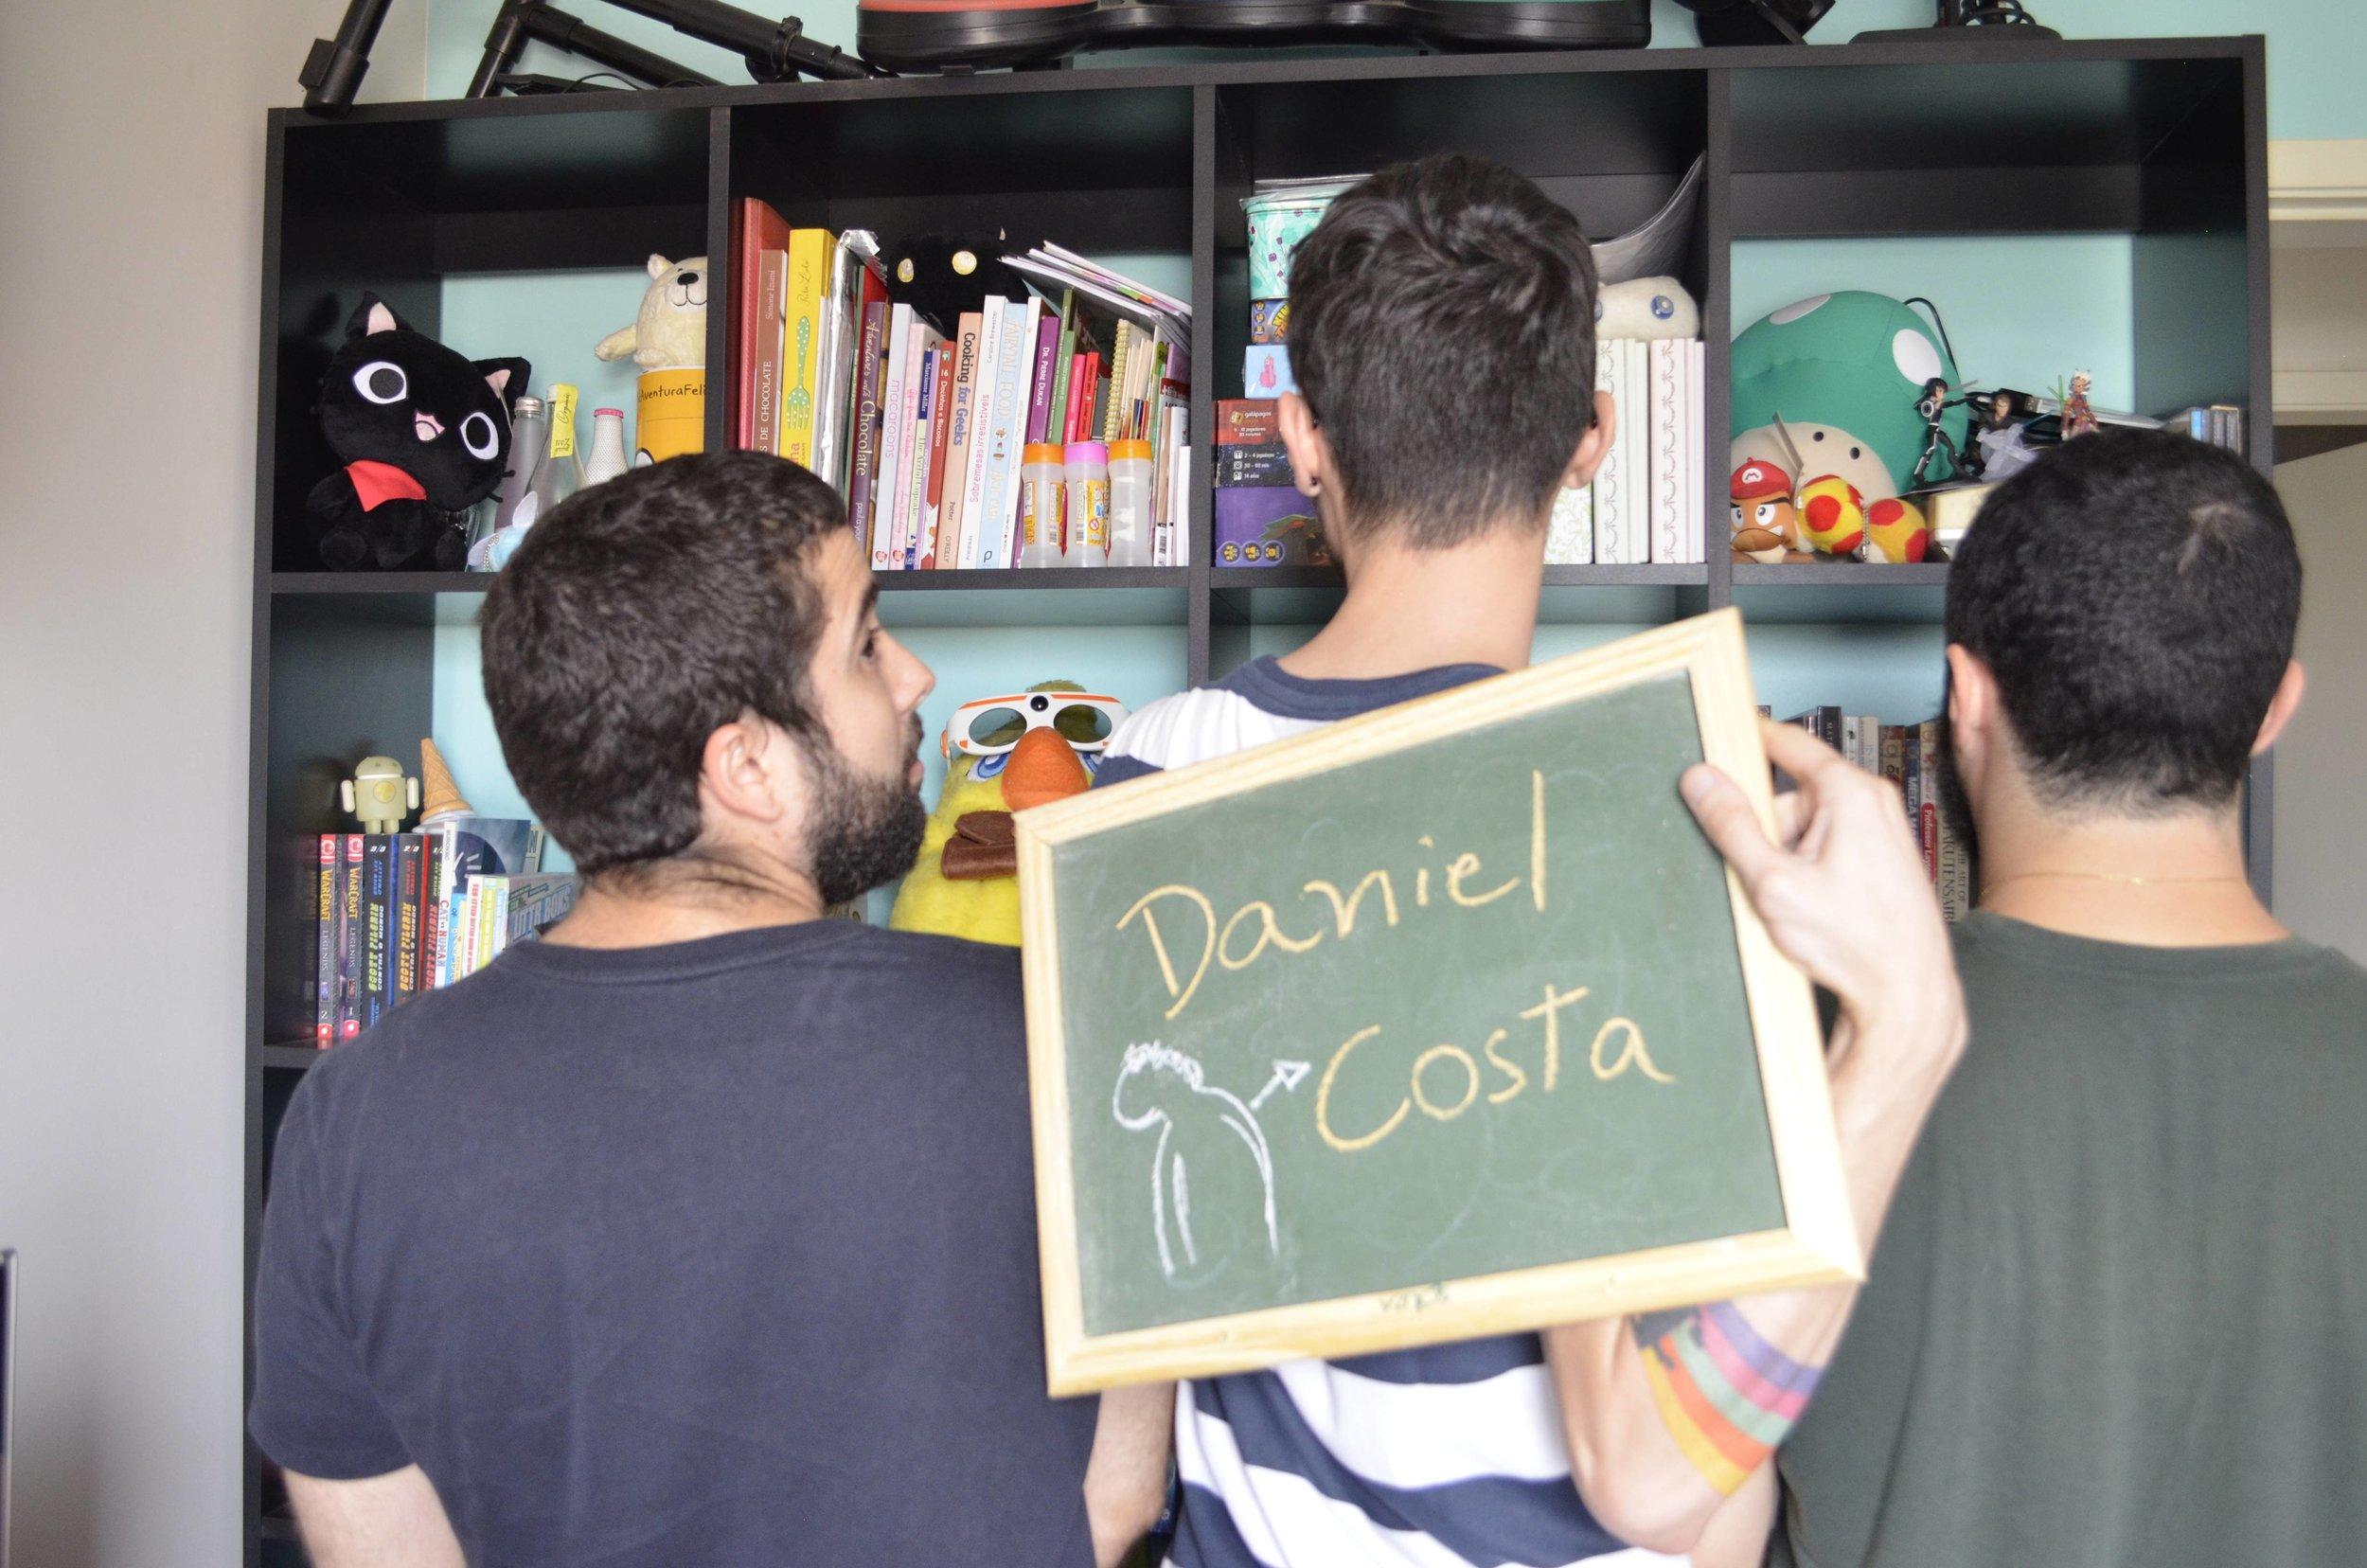 Daniel-Costa.jpg